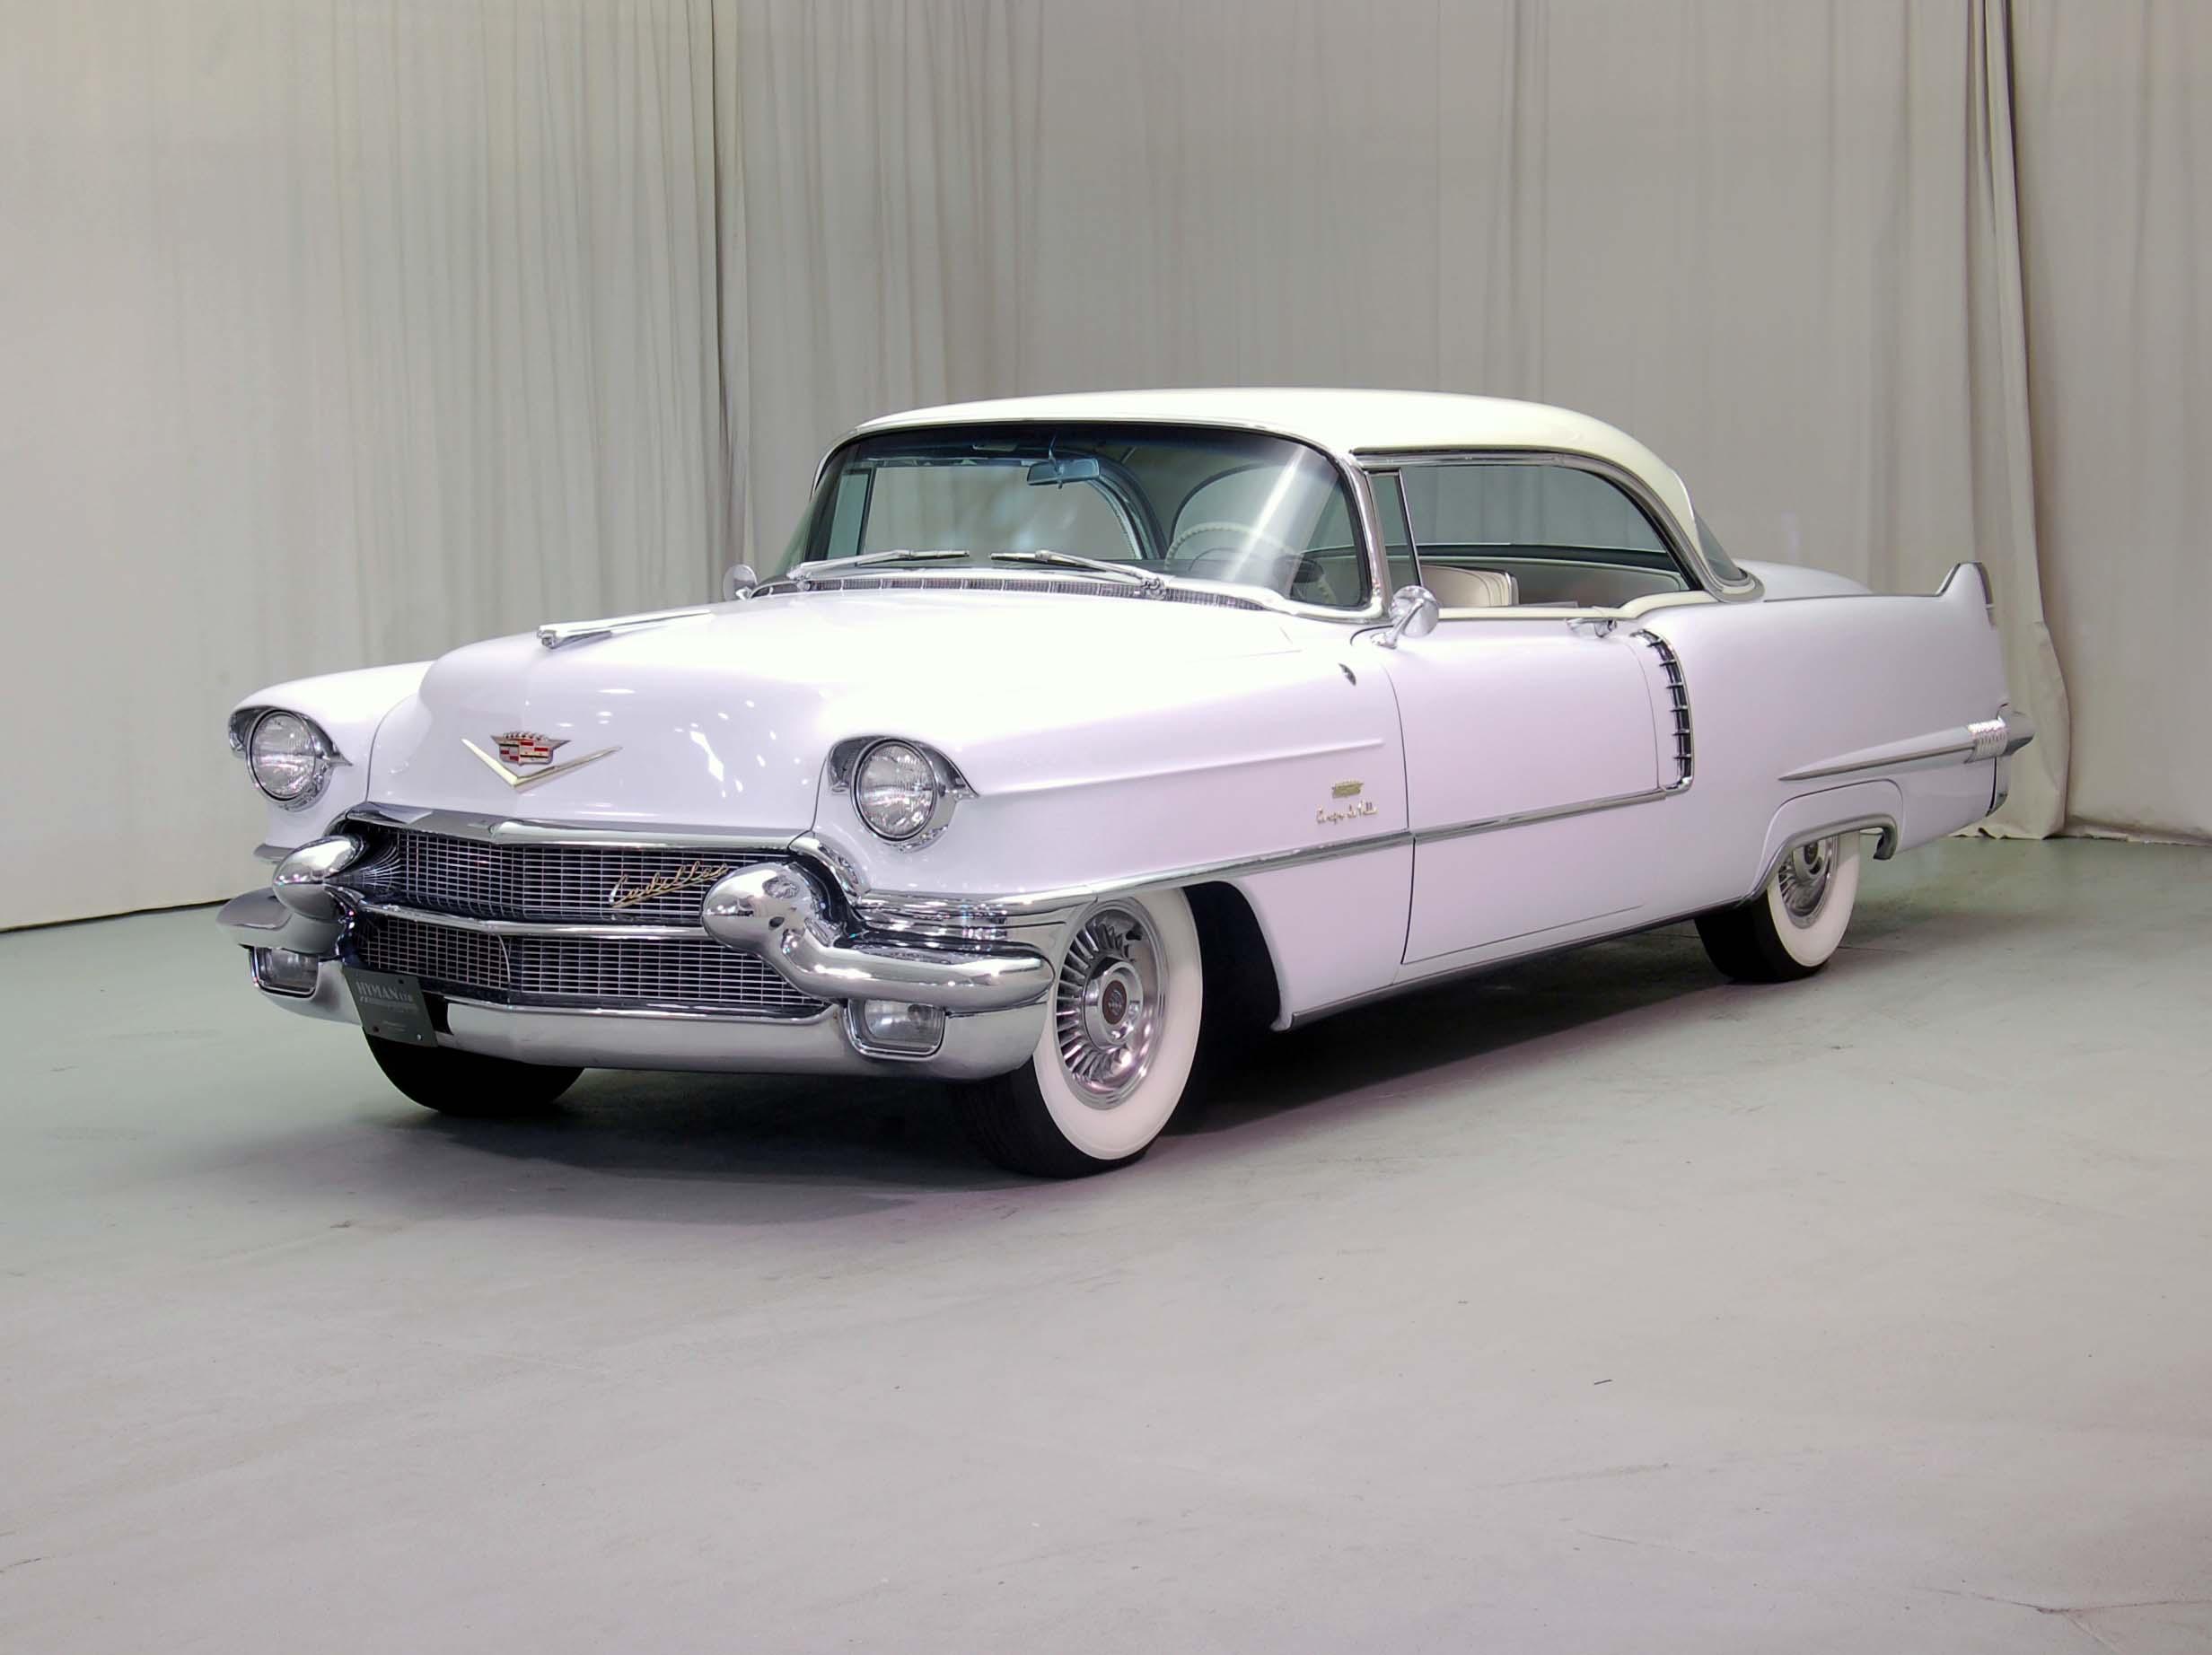 Cadillac Series 62 IV 1954 - 1956 Coupe-Hardtop #2